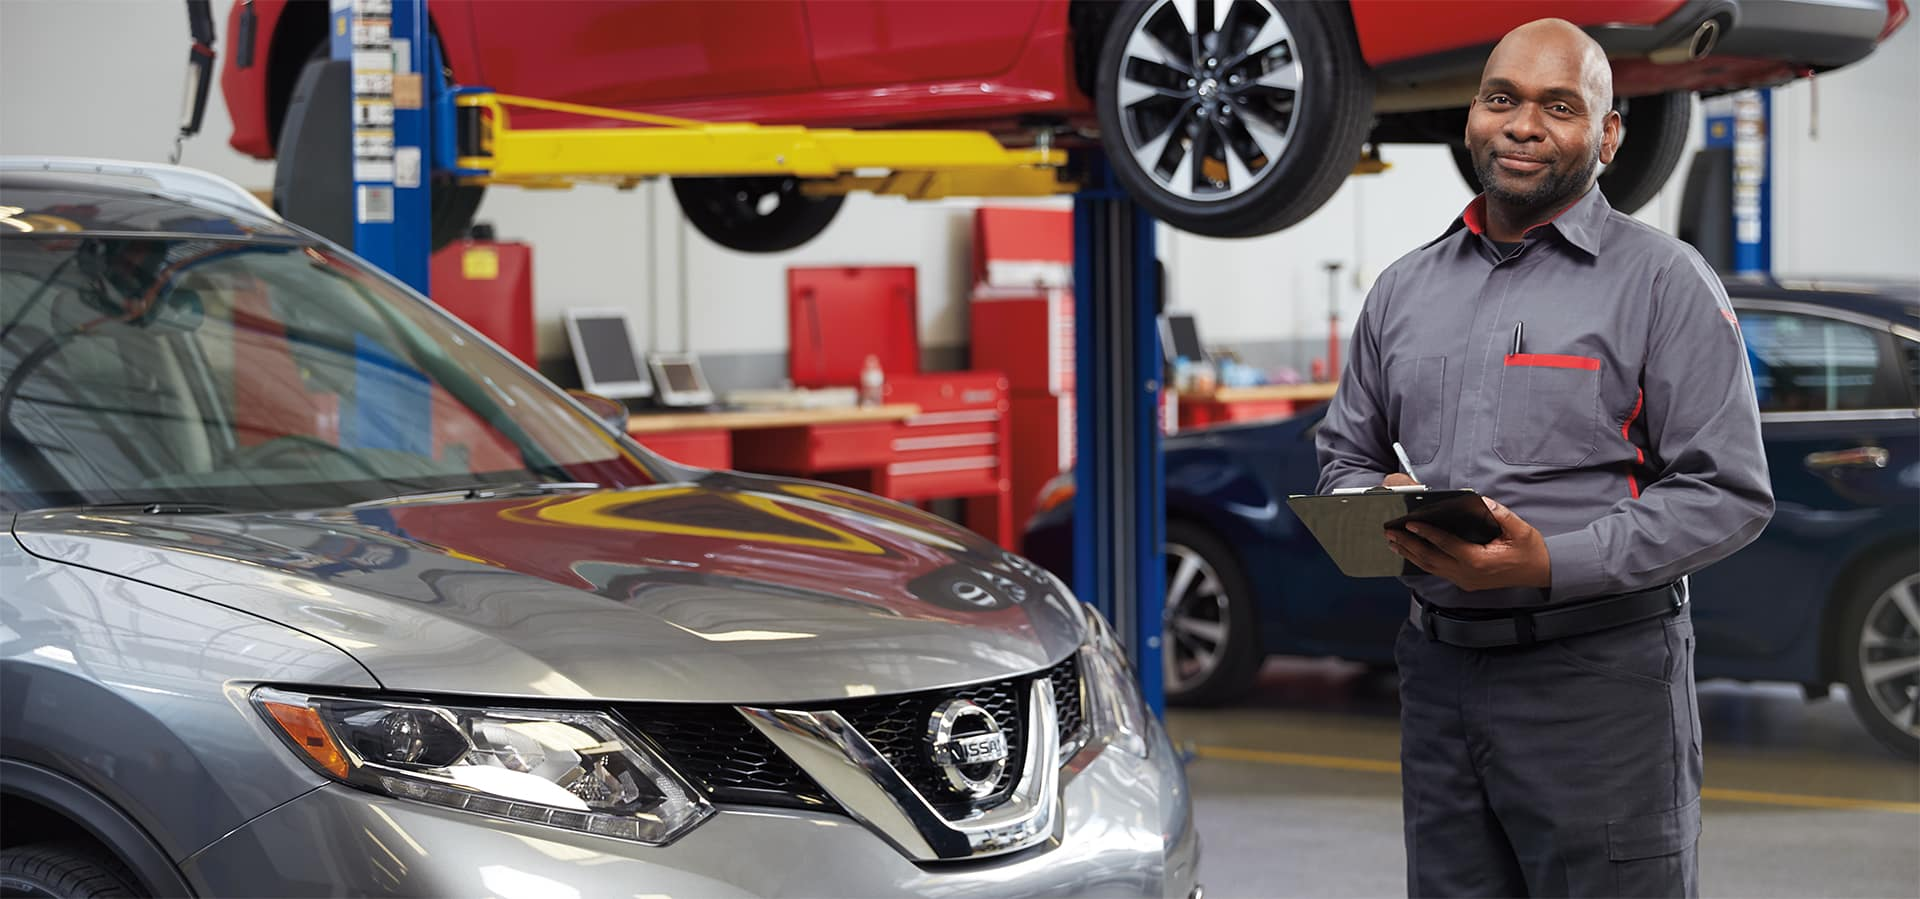 Boch Nissan is a Nissan Dealer Near Walpole MA | Nissan Service Advisor Standing Next to Nissan SUV